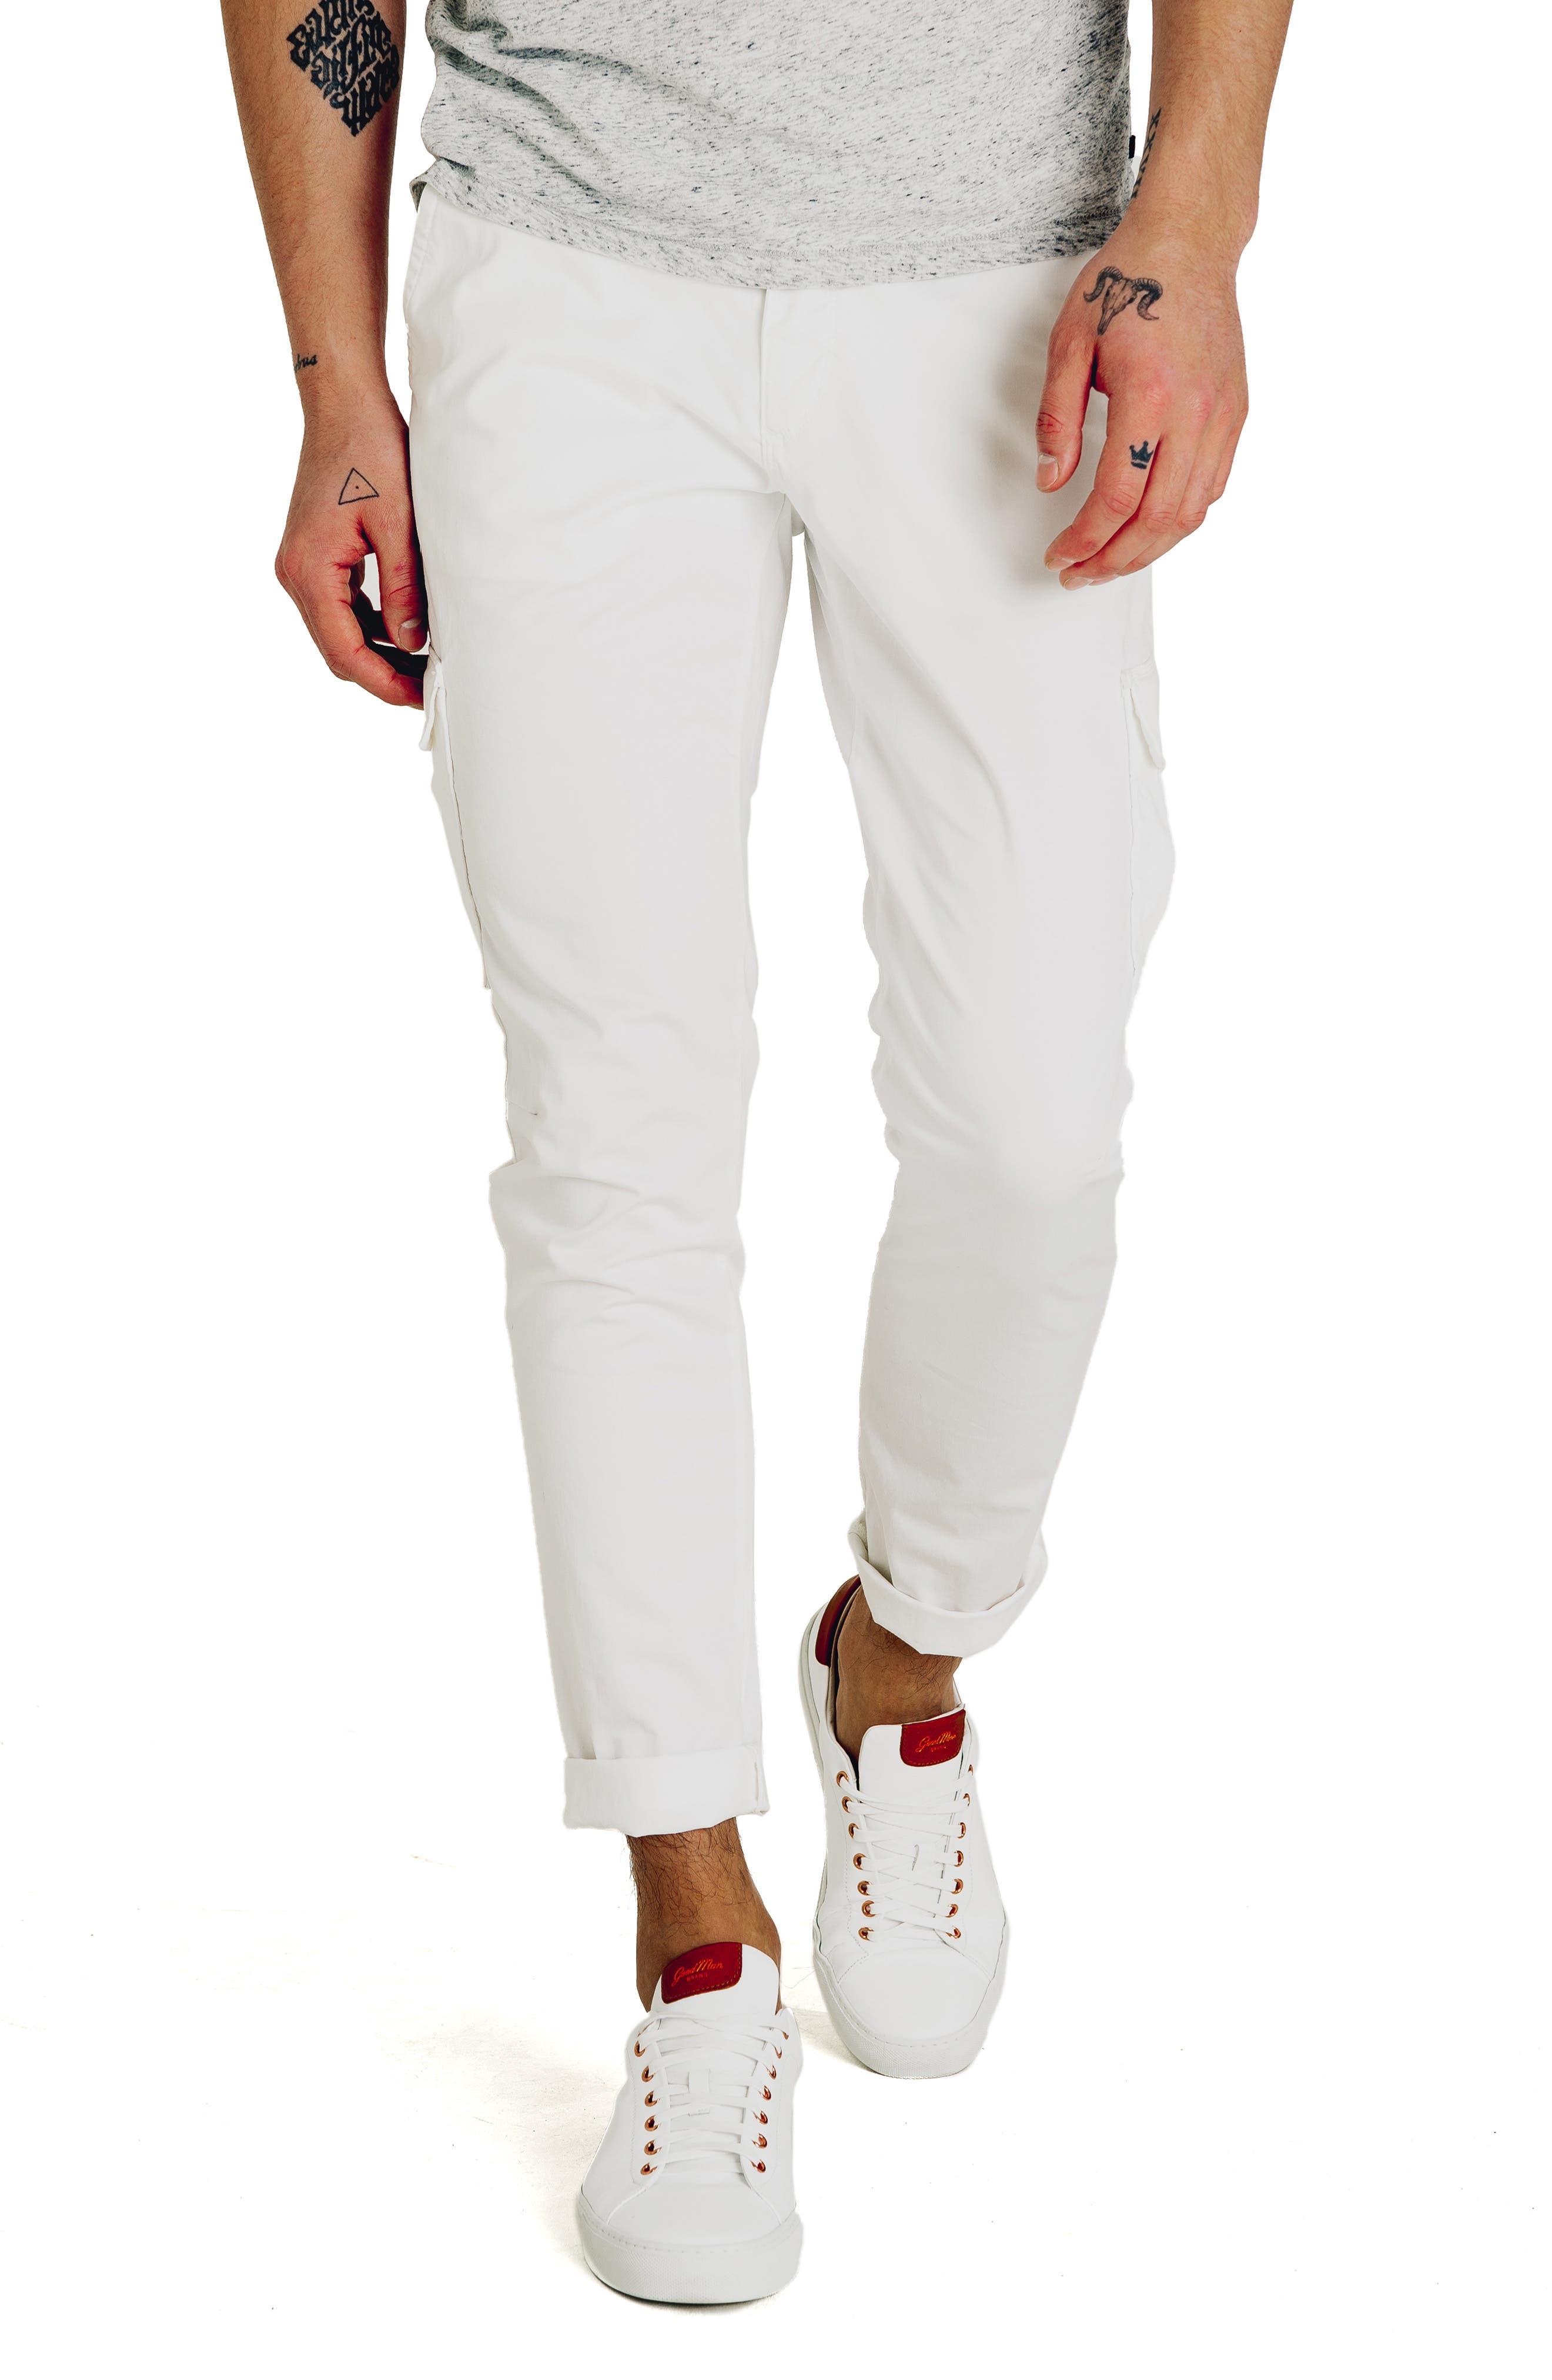 Good Man Brand Jackknife Slim Fit Cargo Pants, White